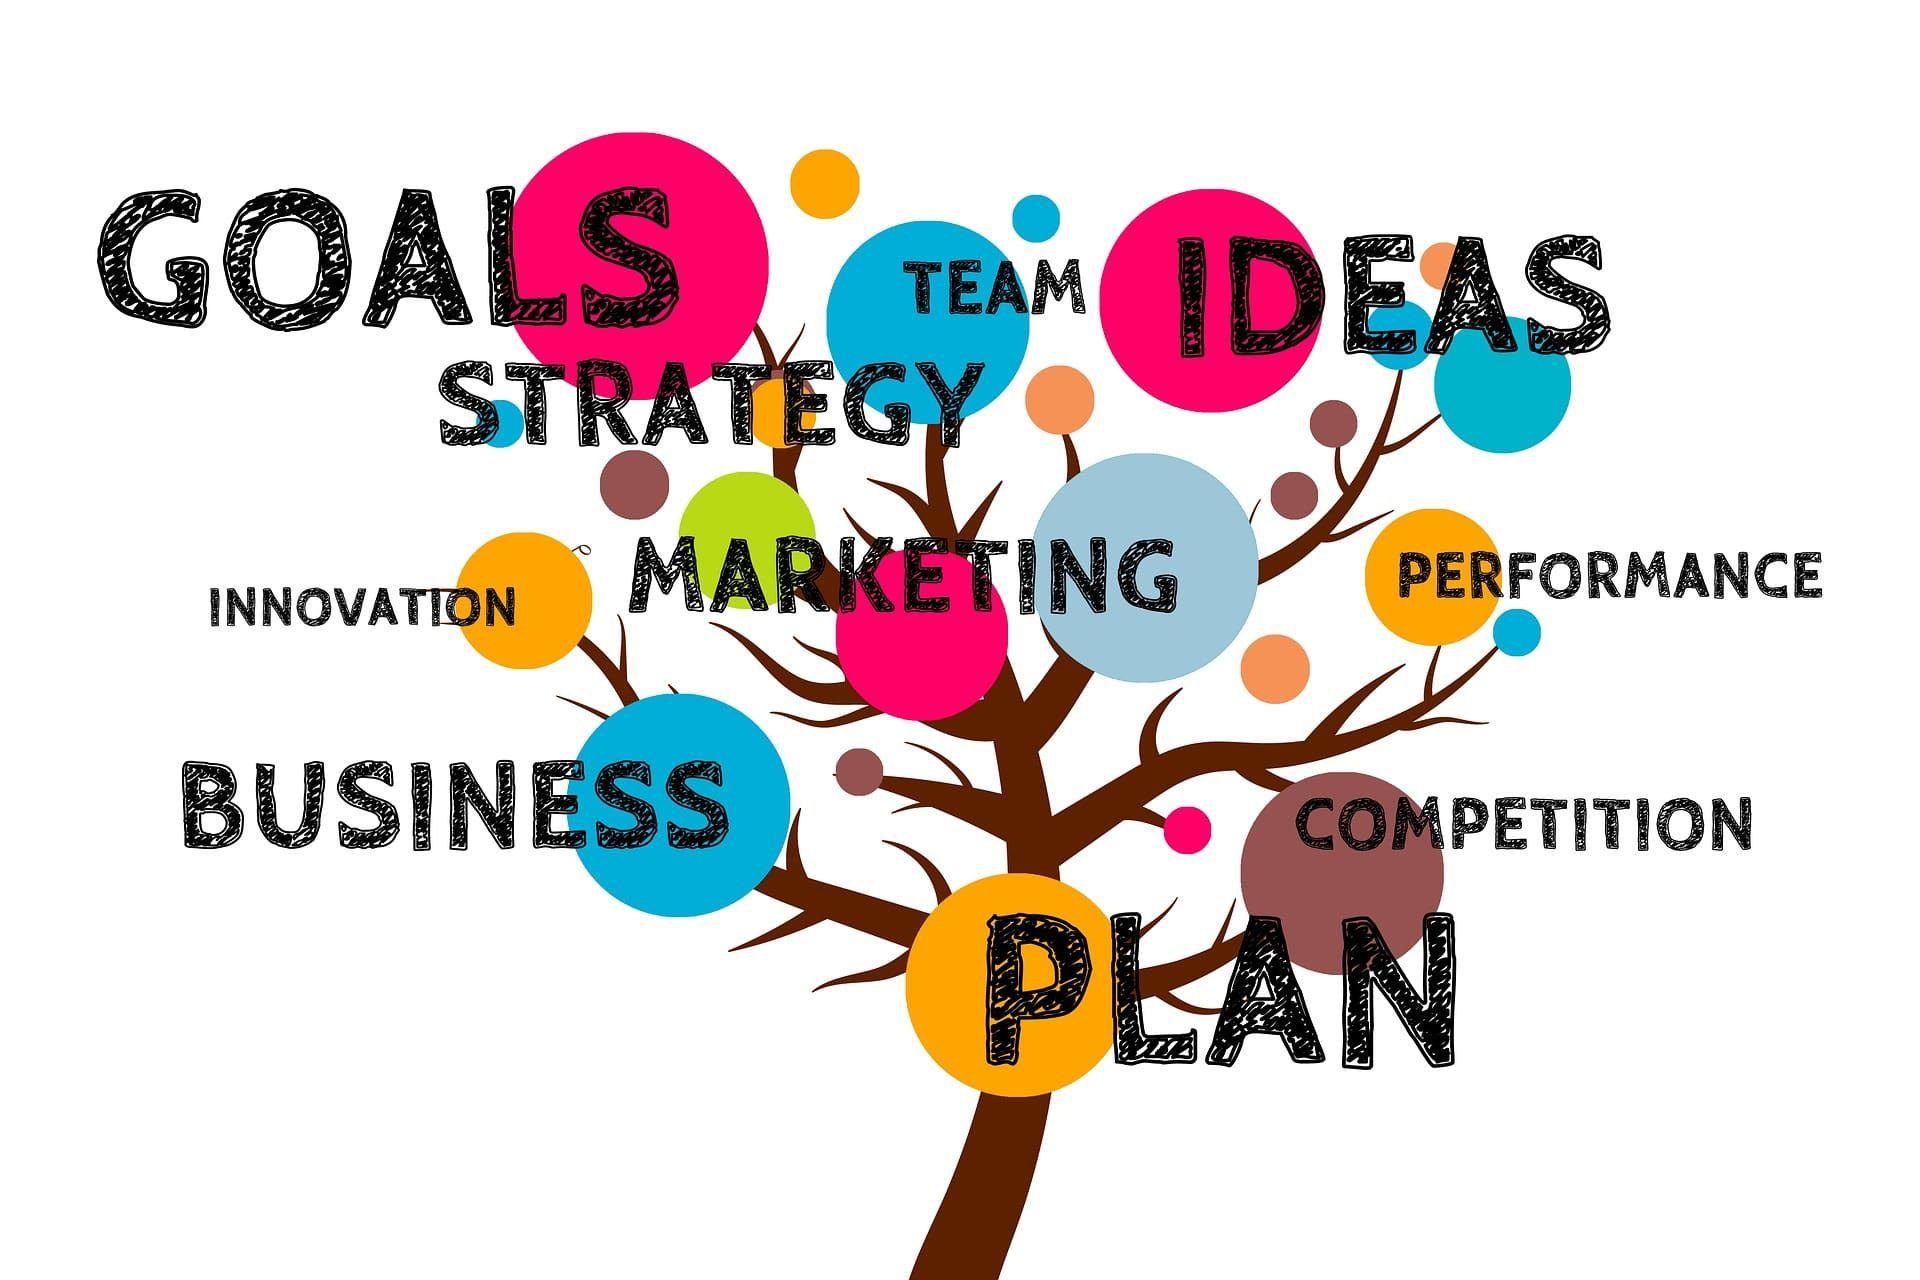 005 Marvelou Multi Level Marketing Busines Plan Template Design  Network PdfFull